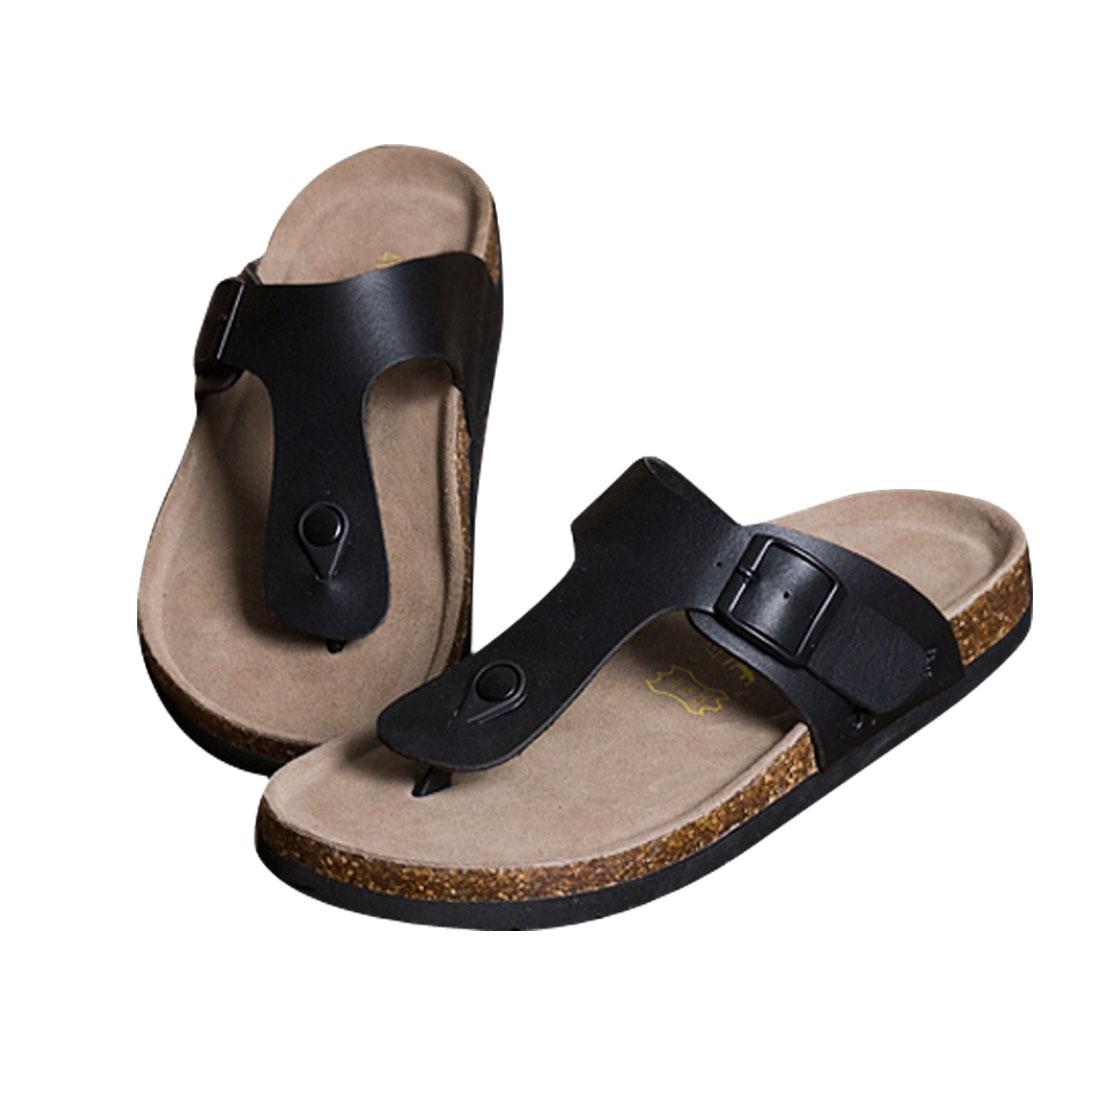 Men Black US Size 10 Adjustable Strap Waterproof Sole Leisure Sandal